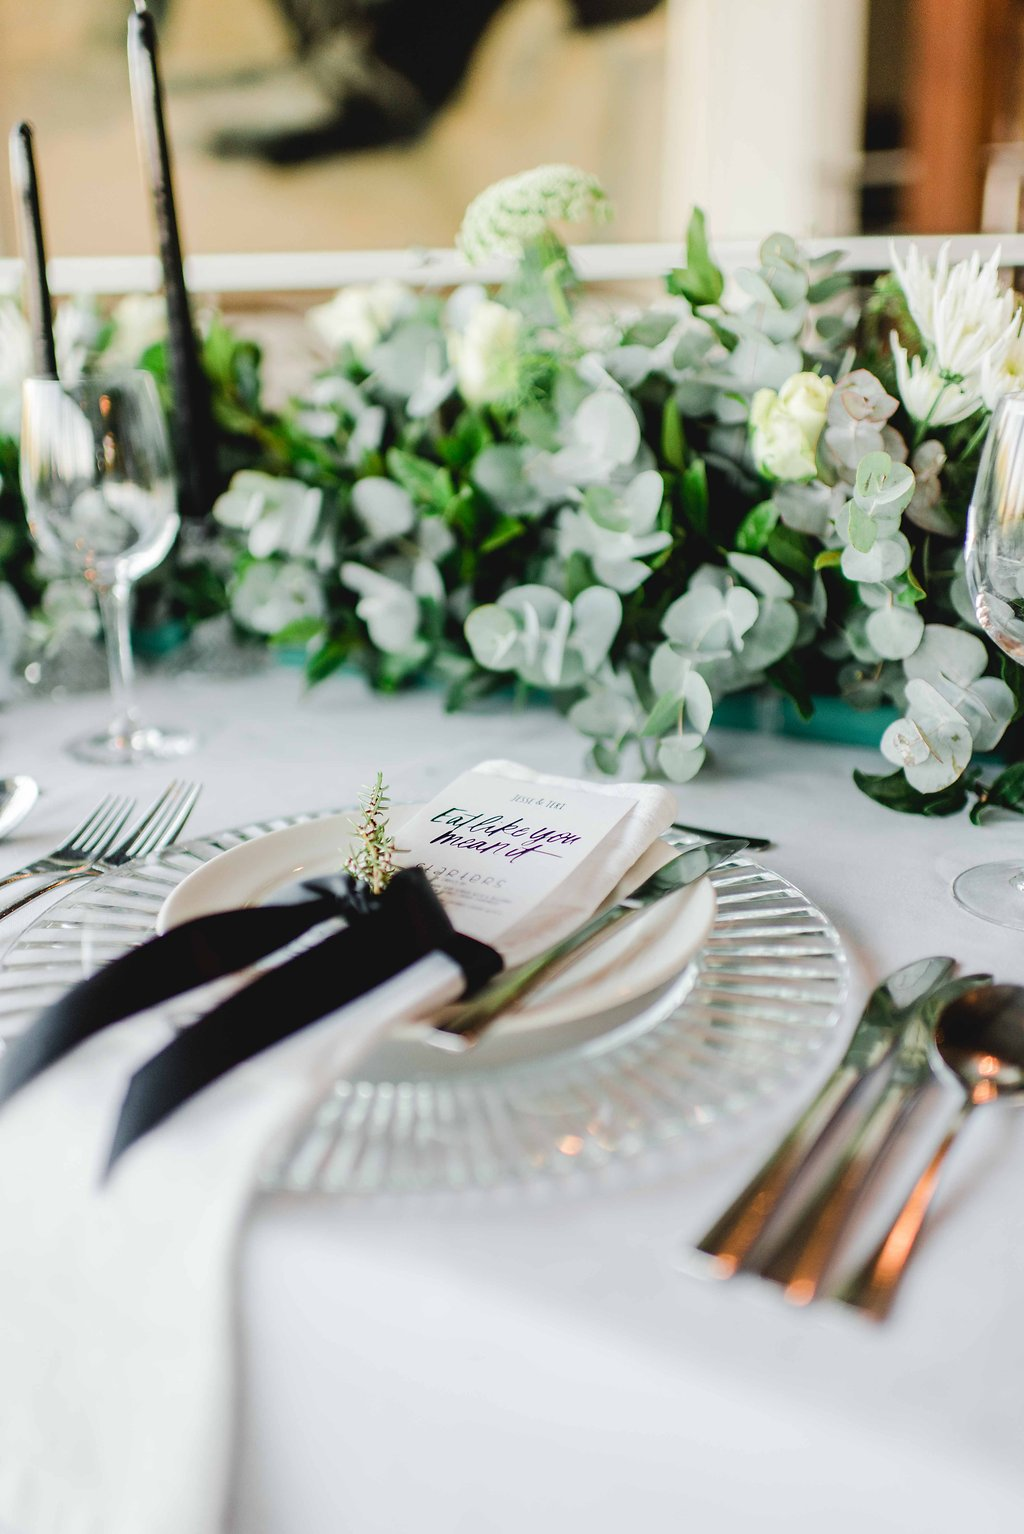 Graceful Greenery Wedding Place Setting | Image: Carla Adel